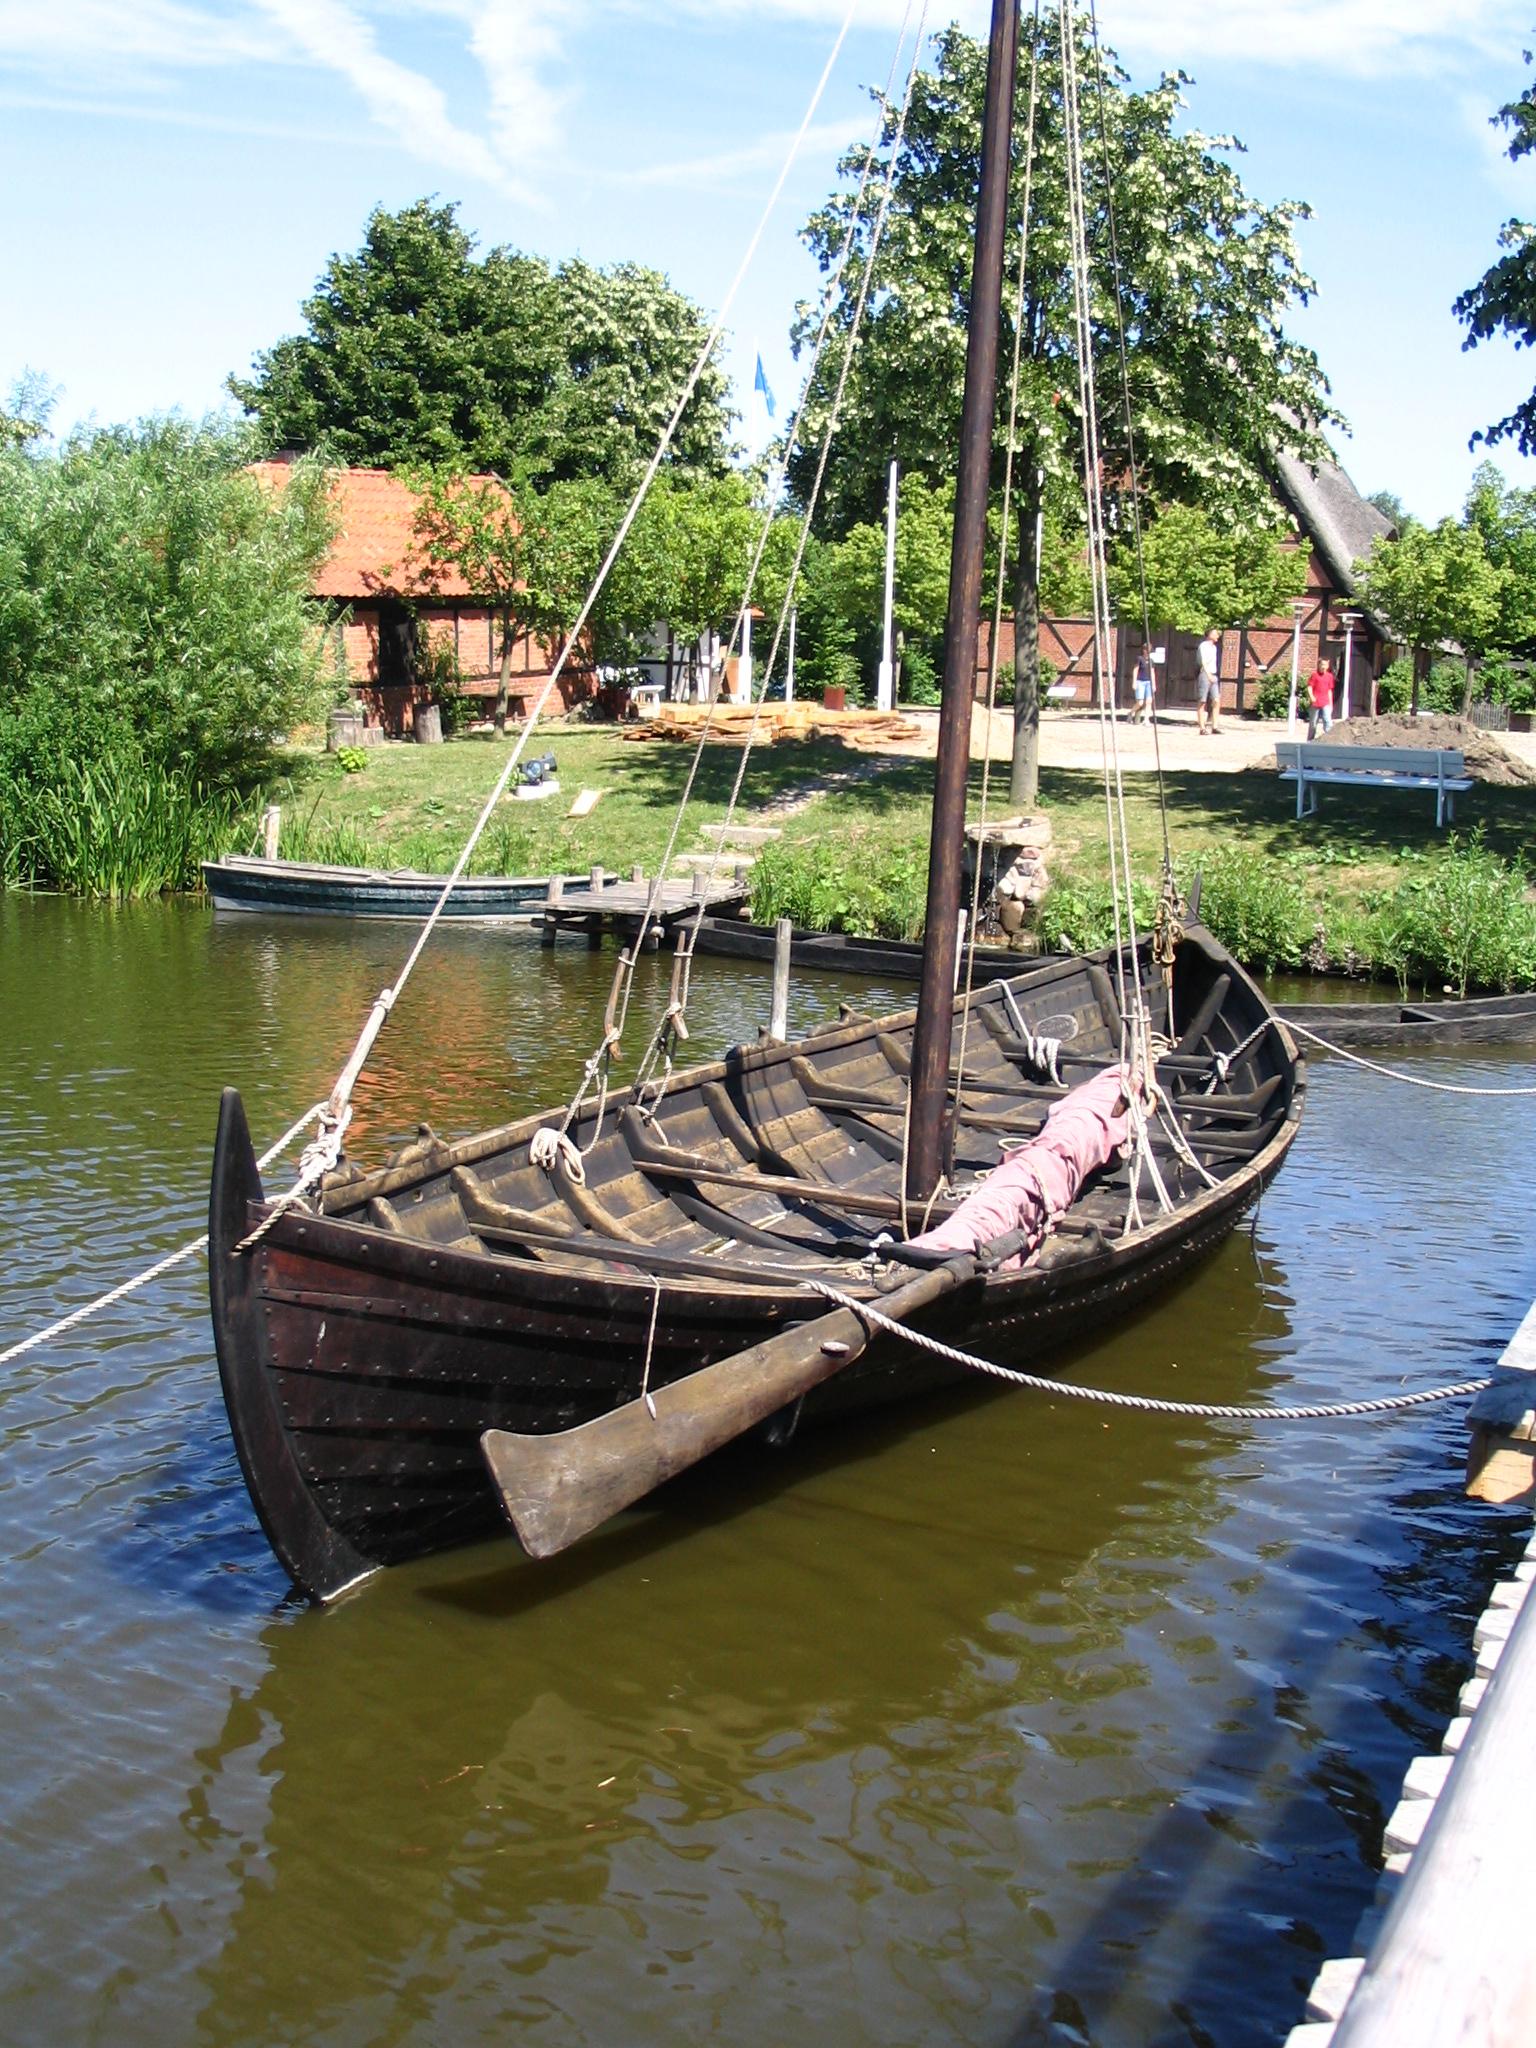 Replica of a Slavic merchant ship.